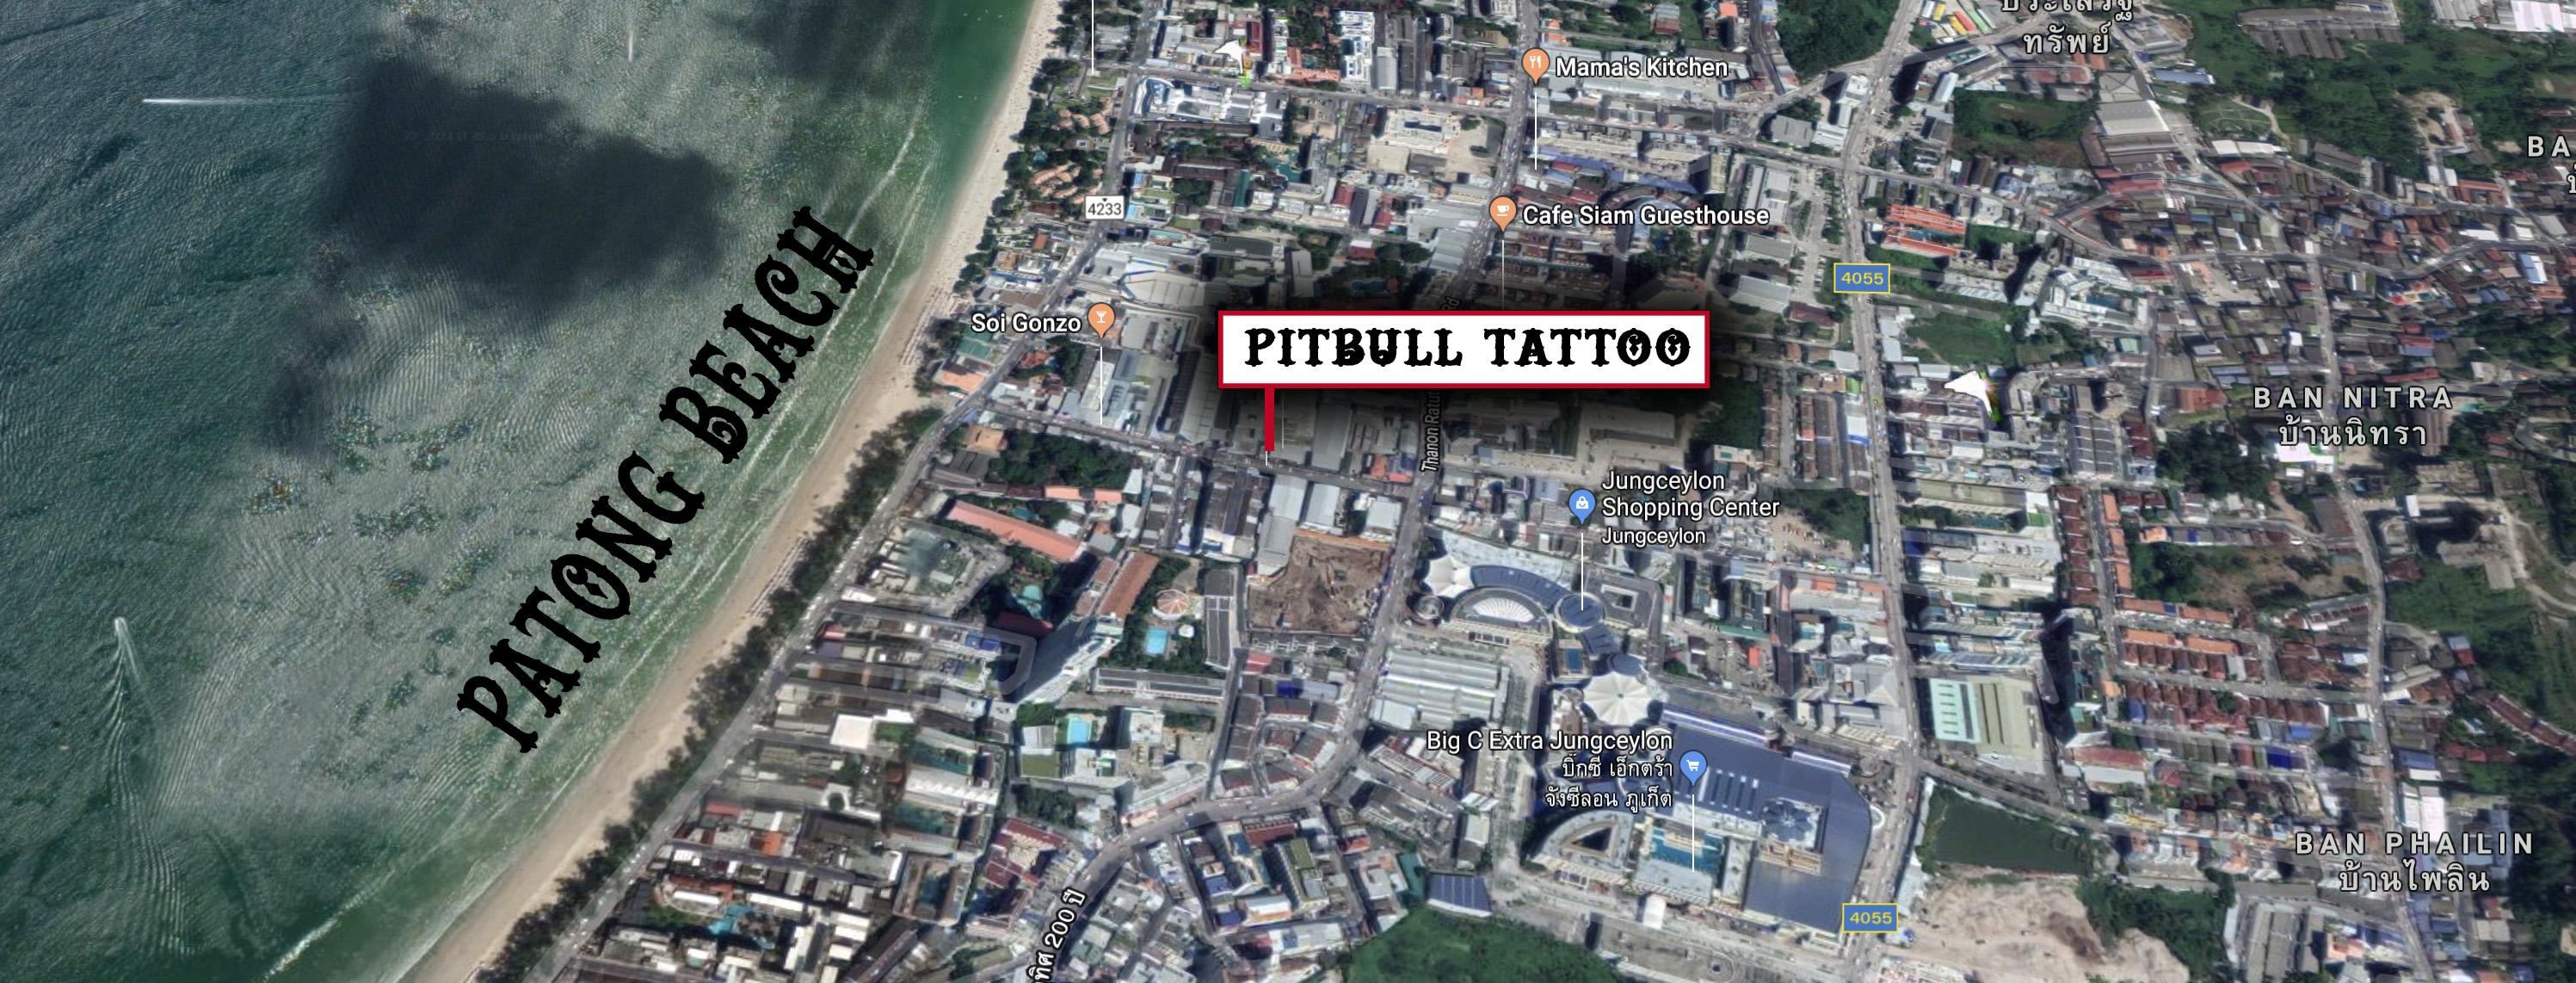 pitbull tattoo thailand location phuket patong